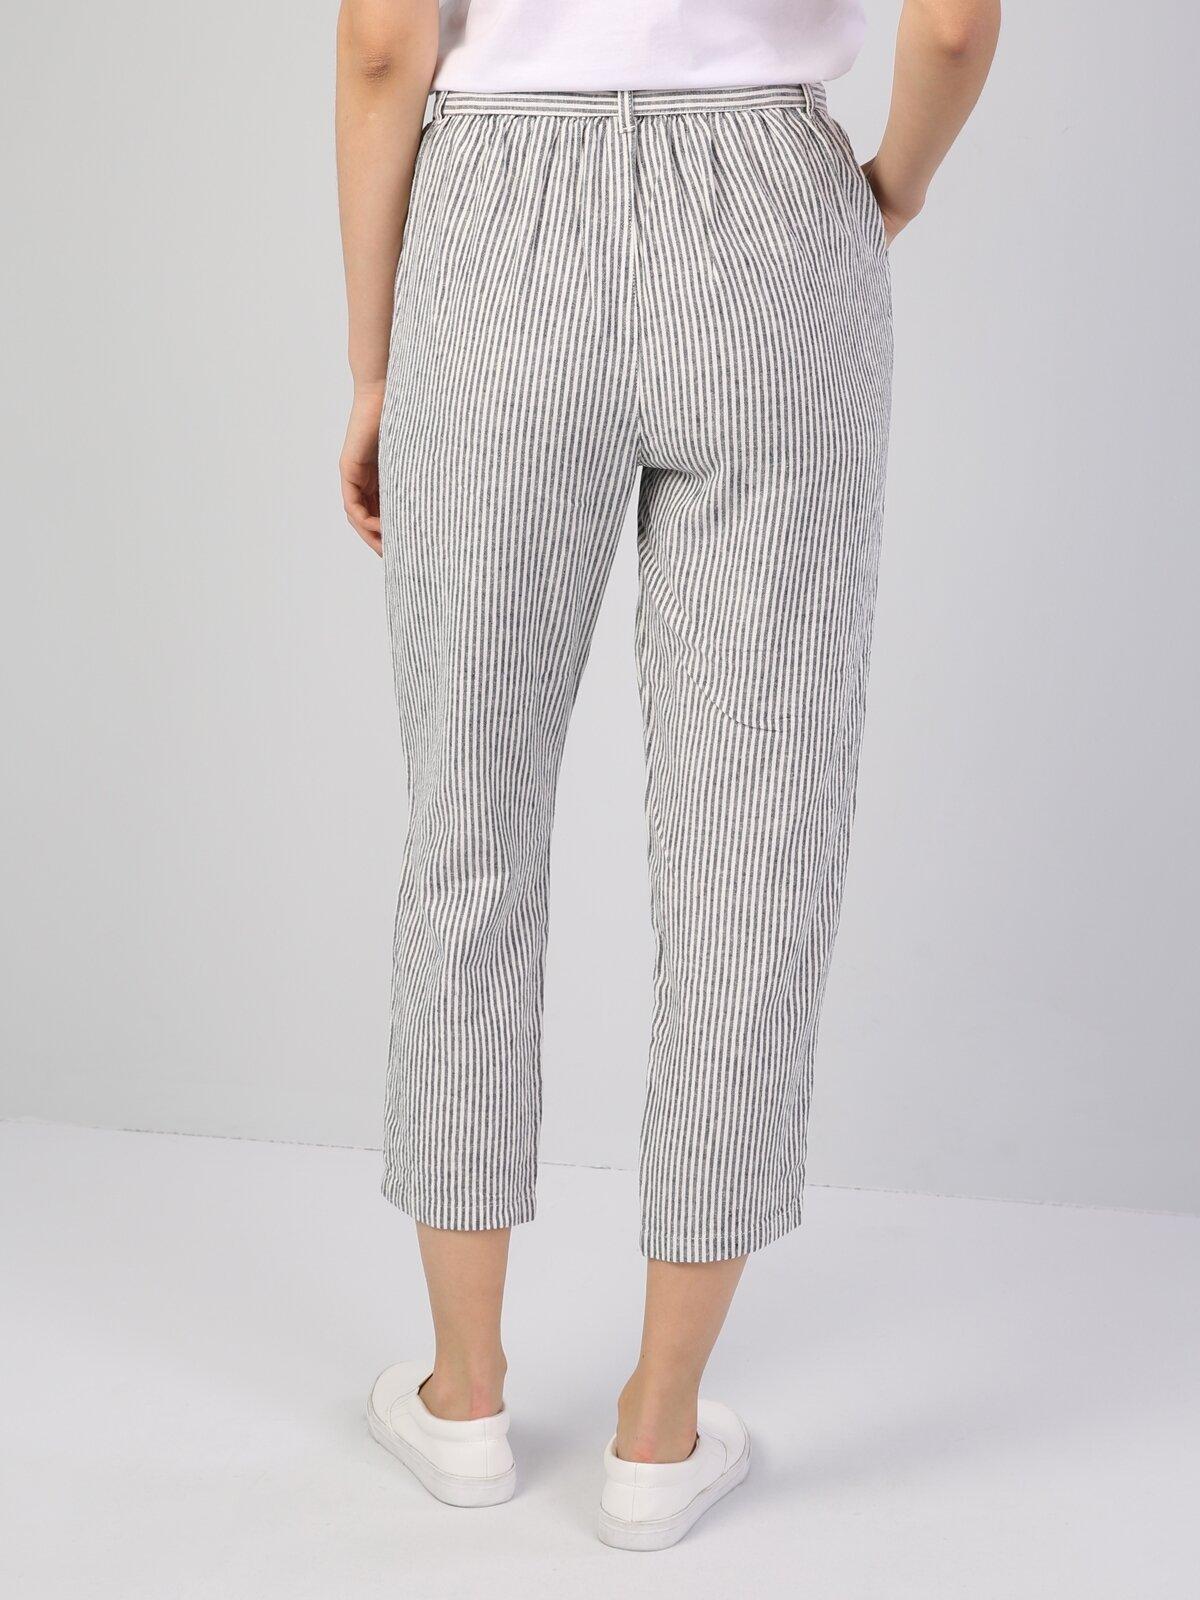 Regular Fit Orta Bel Düz Paça  Kadın Beyaz Pantolon